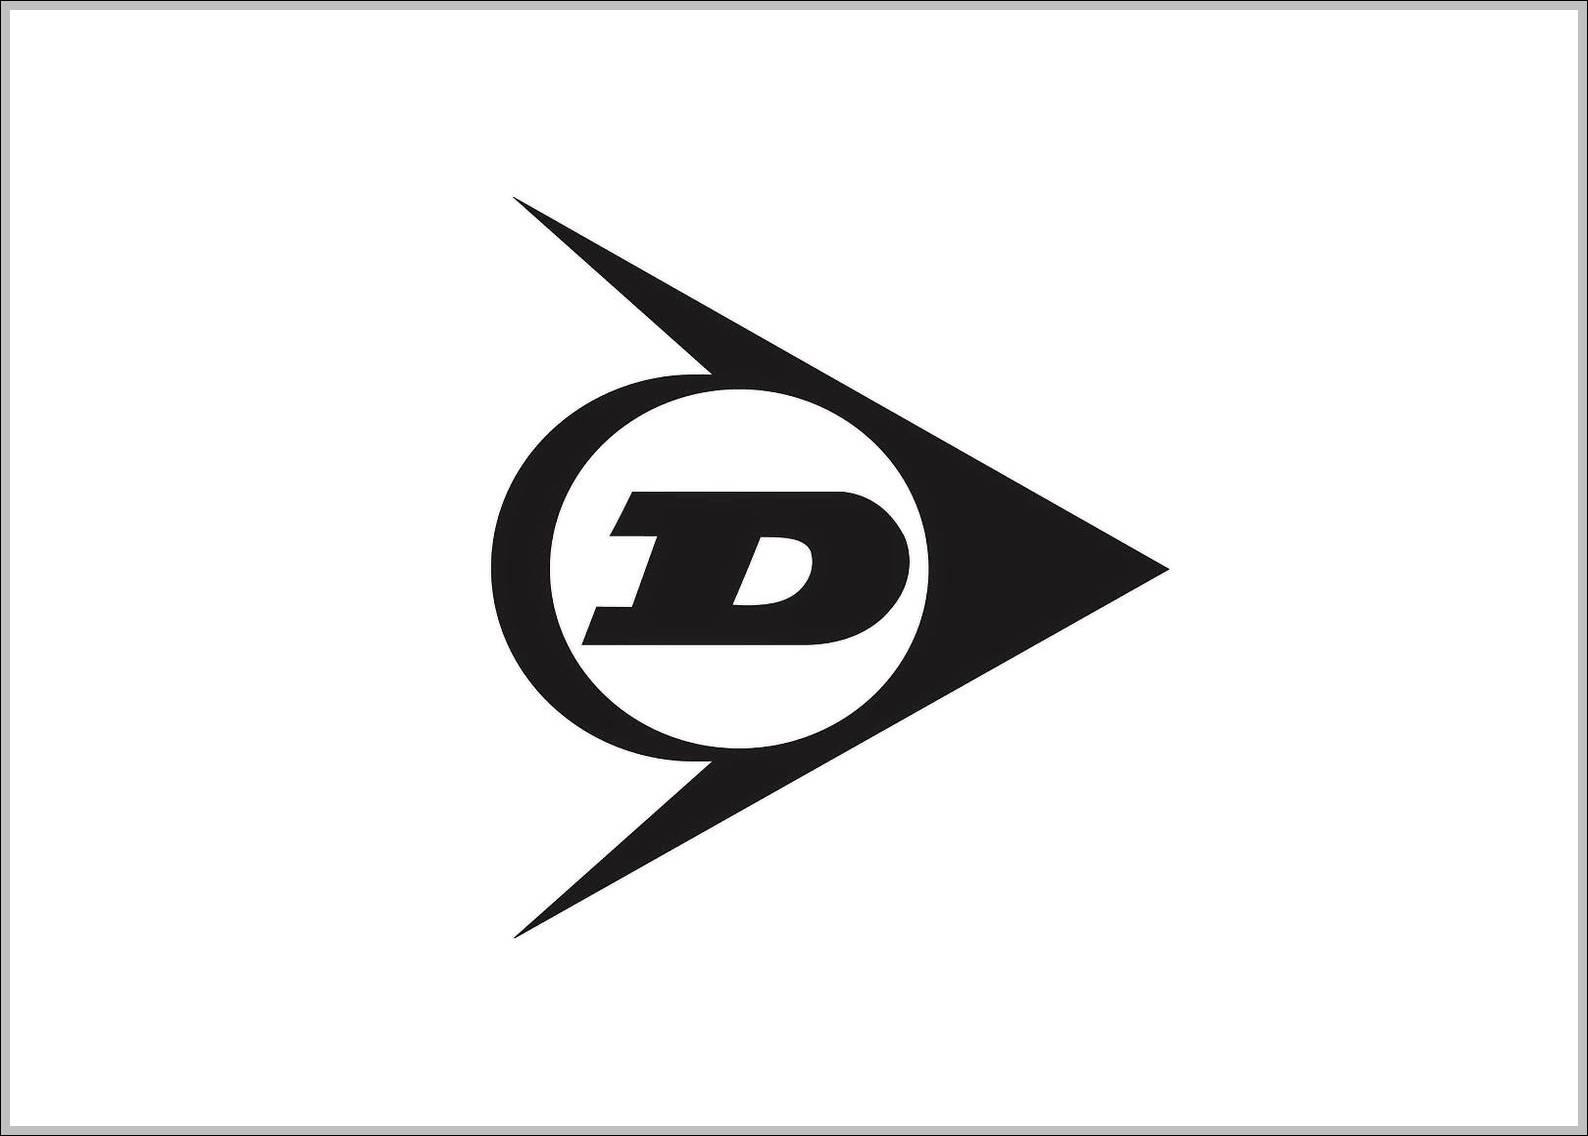 Dunlop flying d logo logo sign logos signs symbols trademarks dunlop flying d logo thecheapjerseys Images